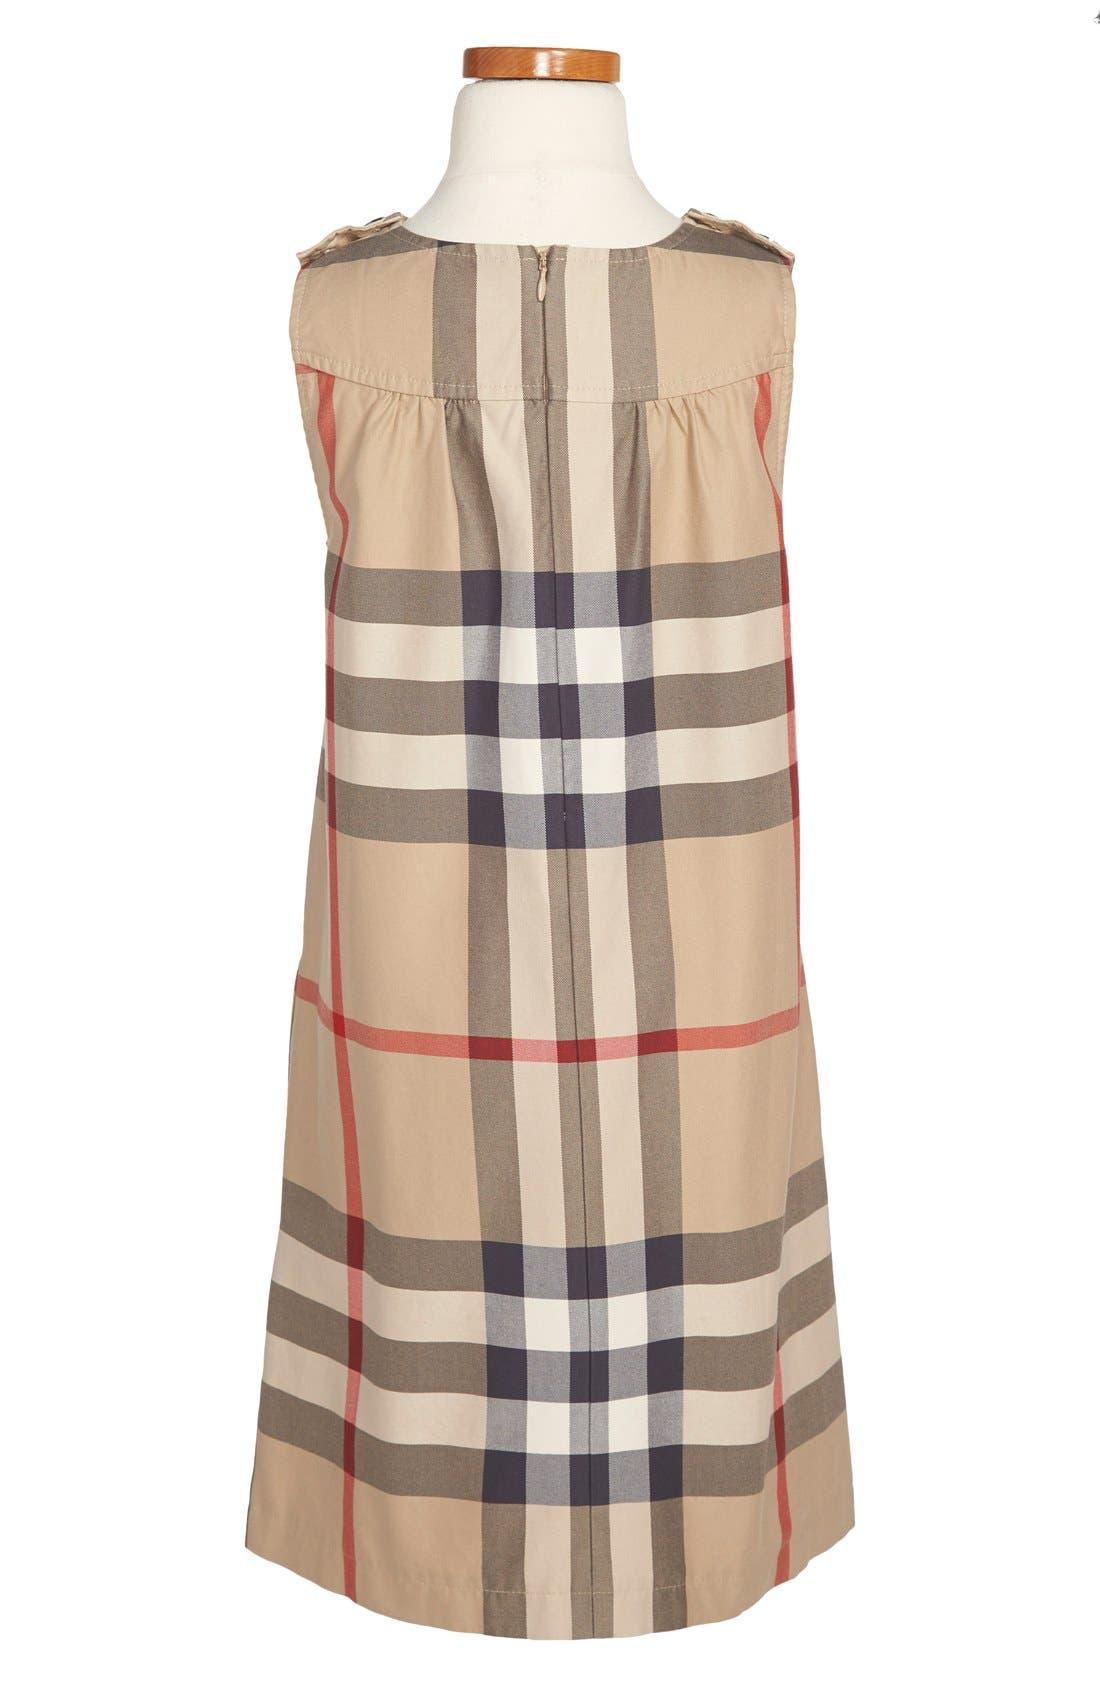 Alternate Image 2  - Burberry Check Print Dress (Little Girls & Big Girls)